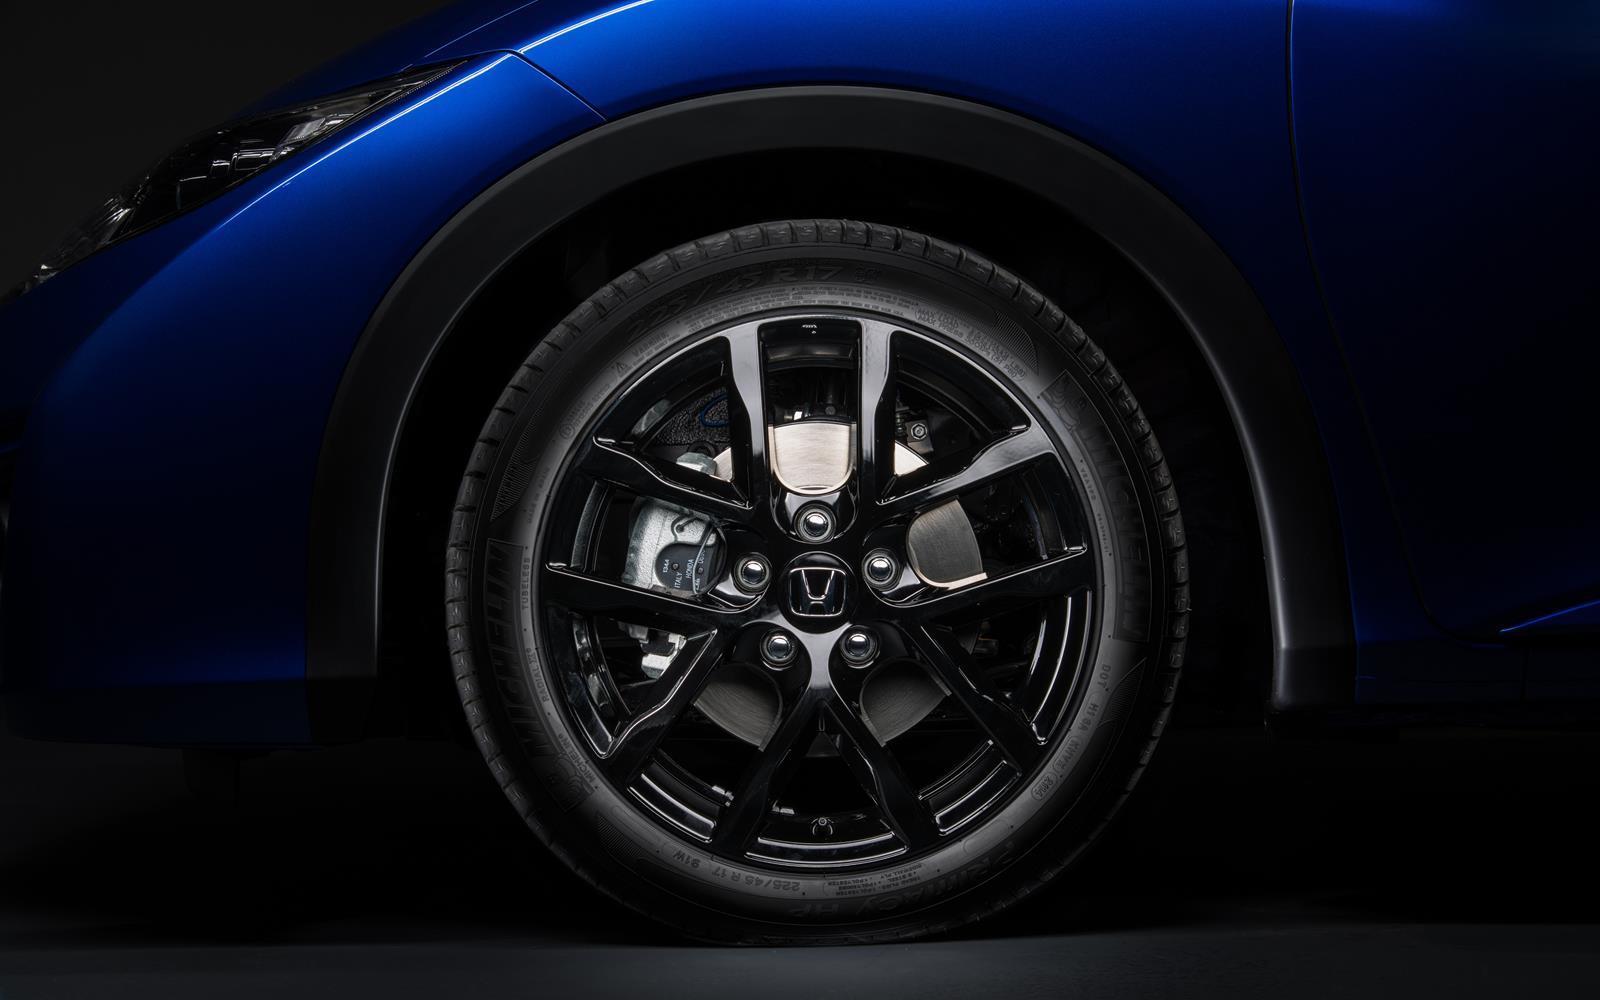 Honda Civic Sport 2014 Alloy Wheel Detail Frontseatdriver